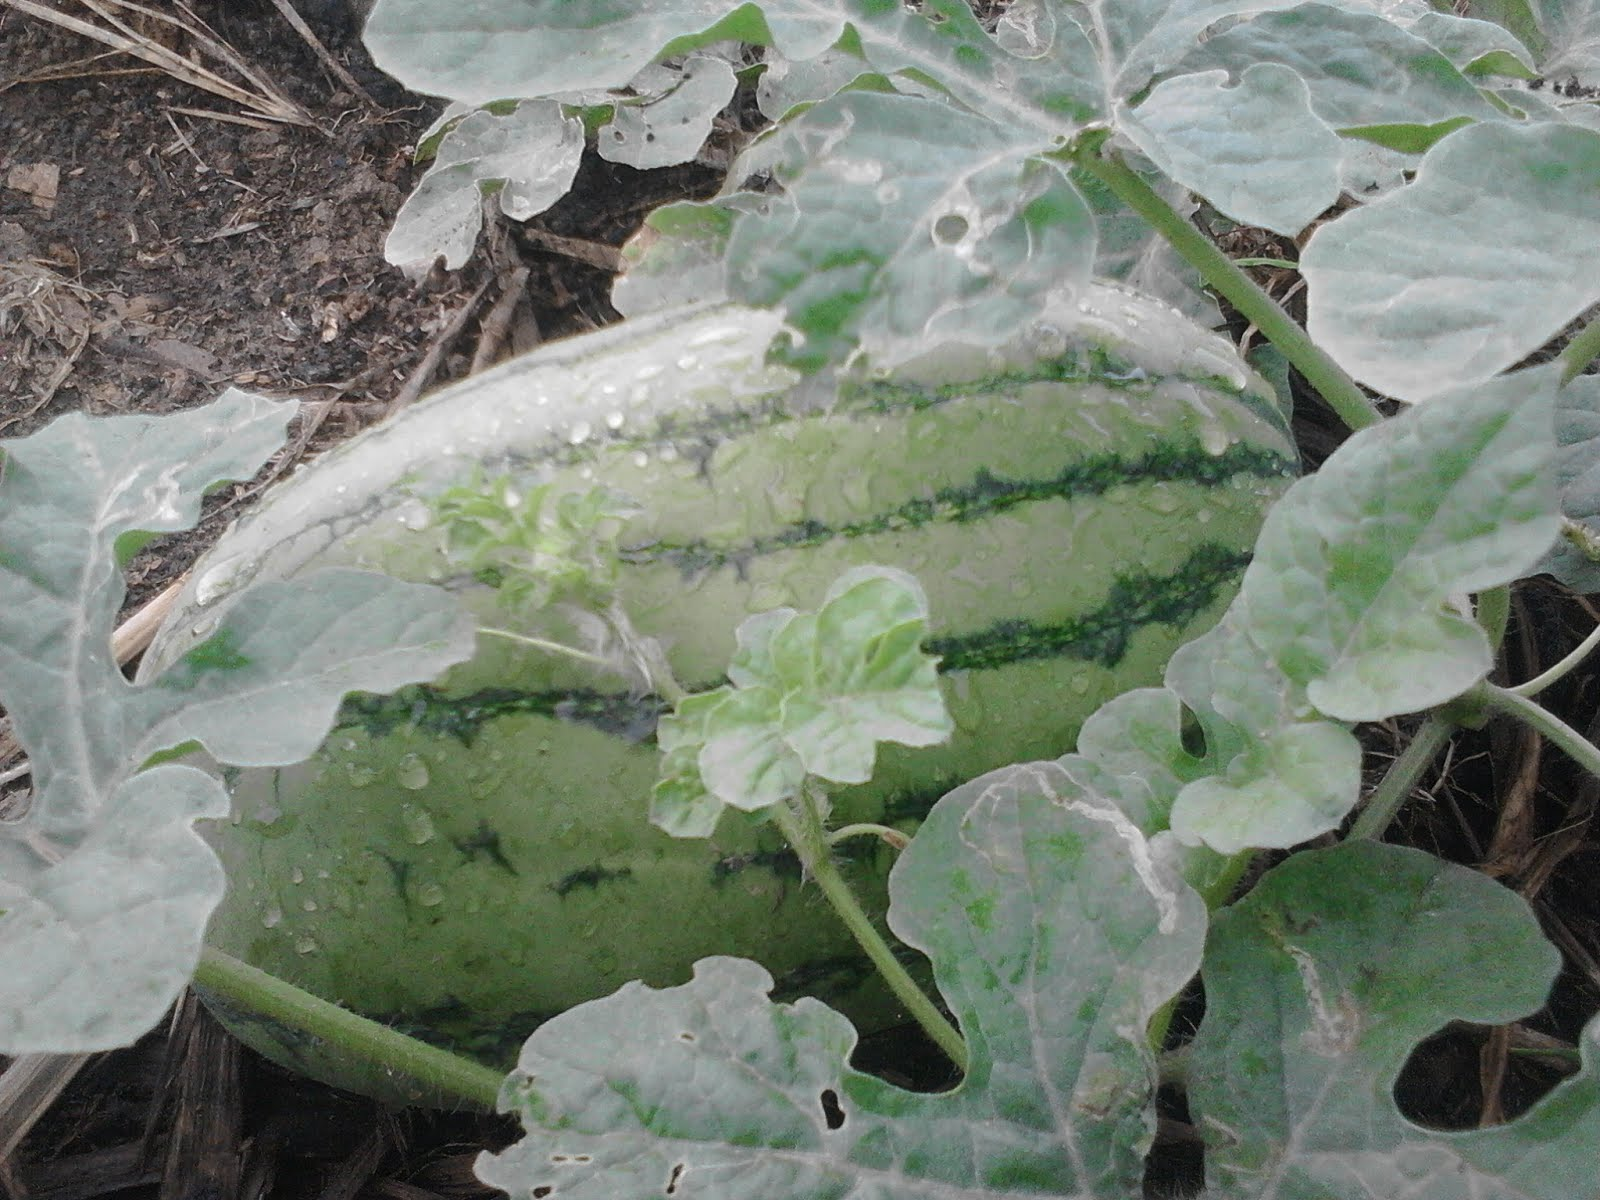 Buah semangka berumur 8-11 hari sejak muncul bakal buah betatnya baru mencapai 3-4kg